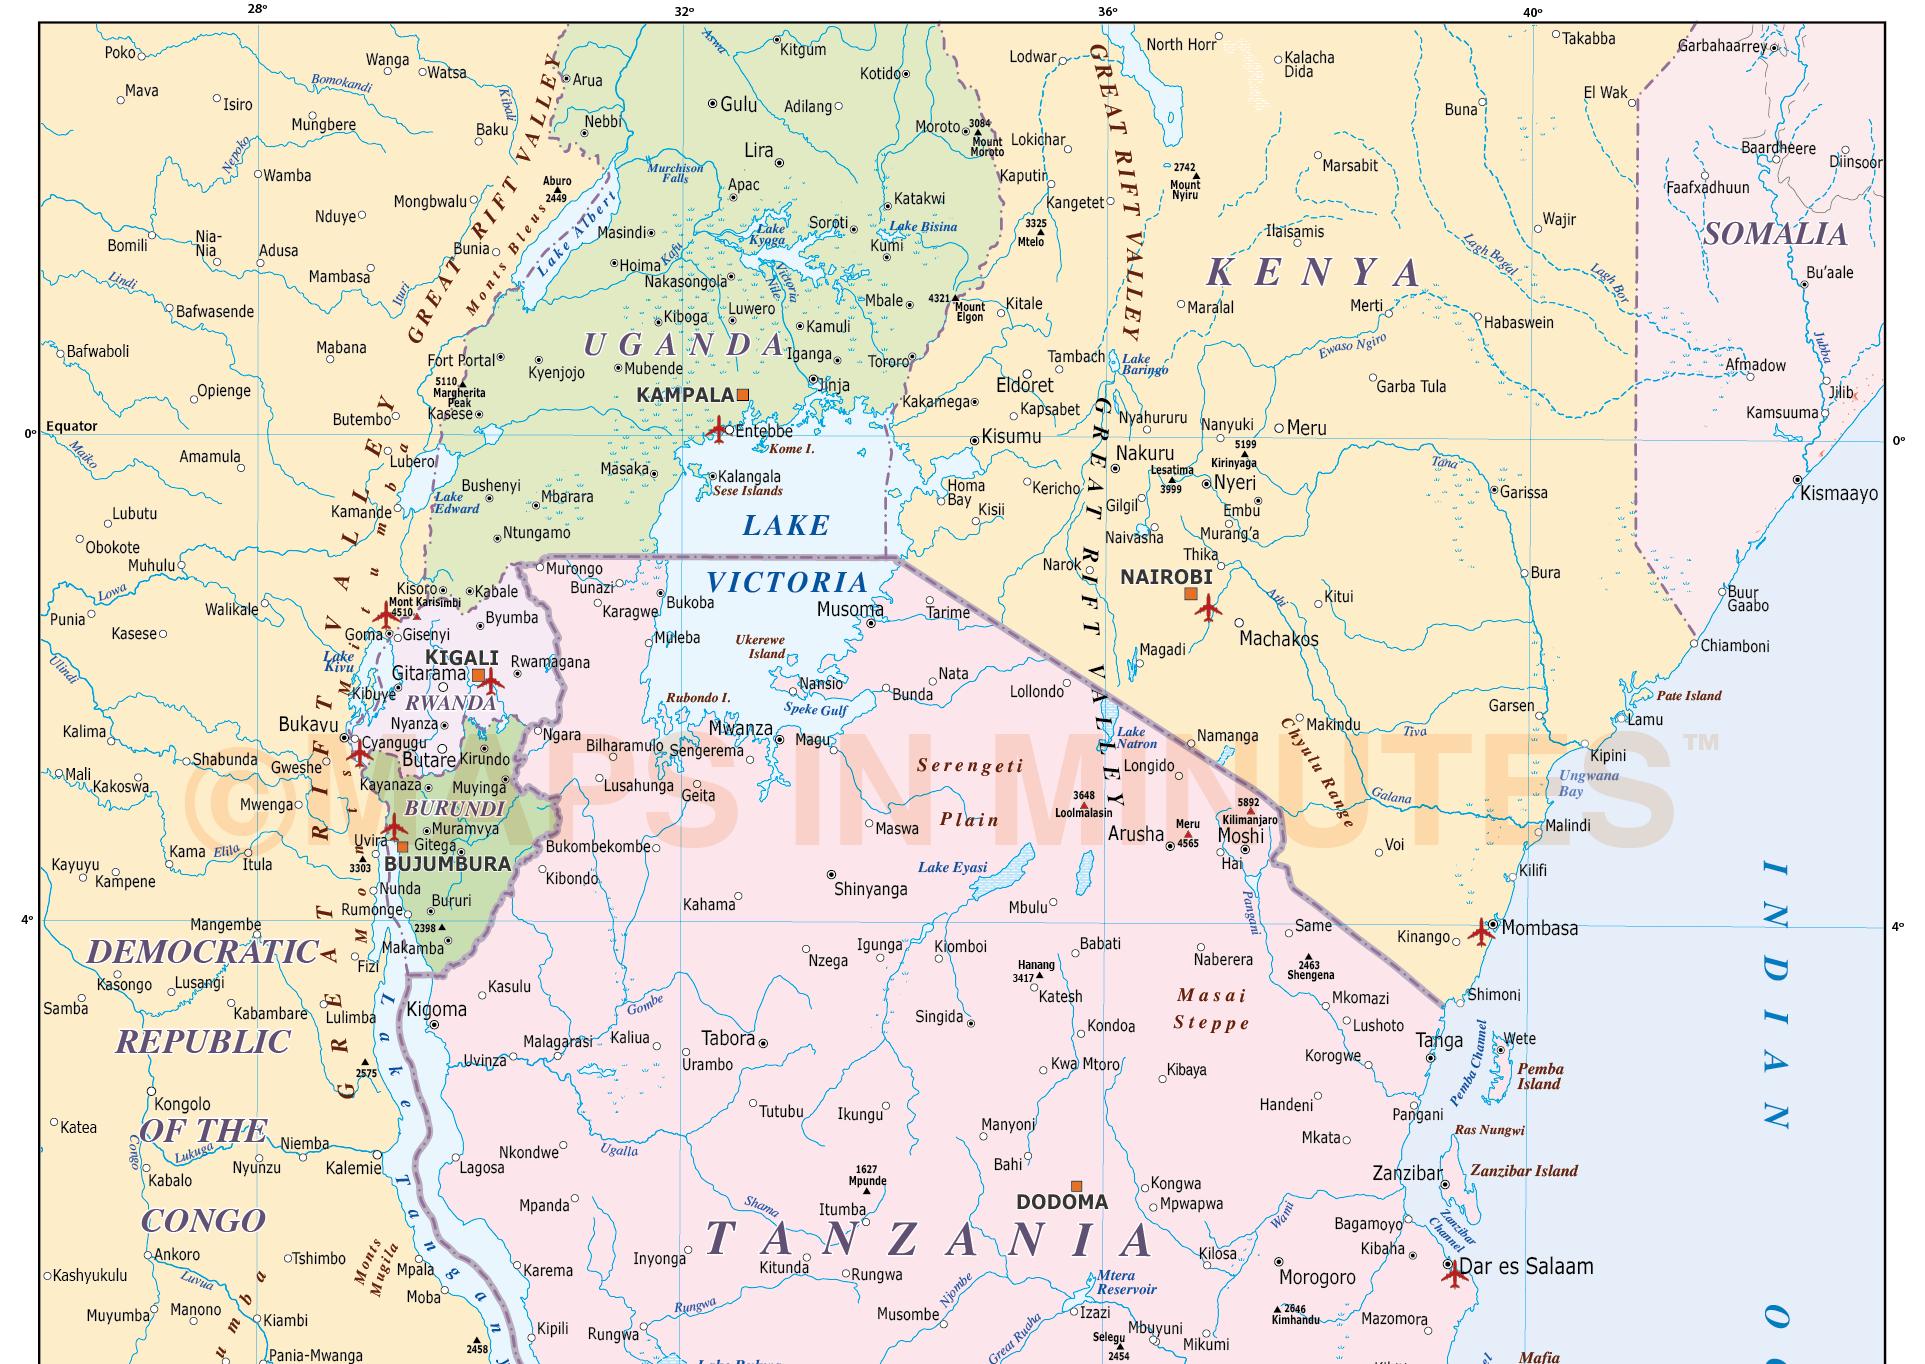 tanzania digital vector political country map in